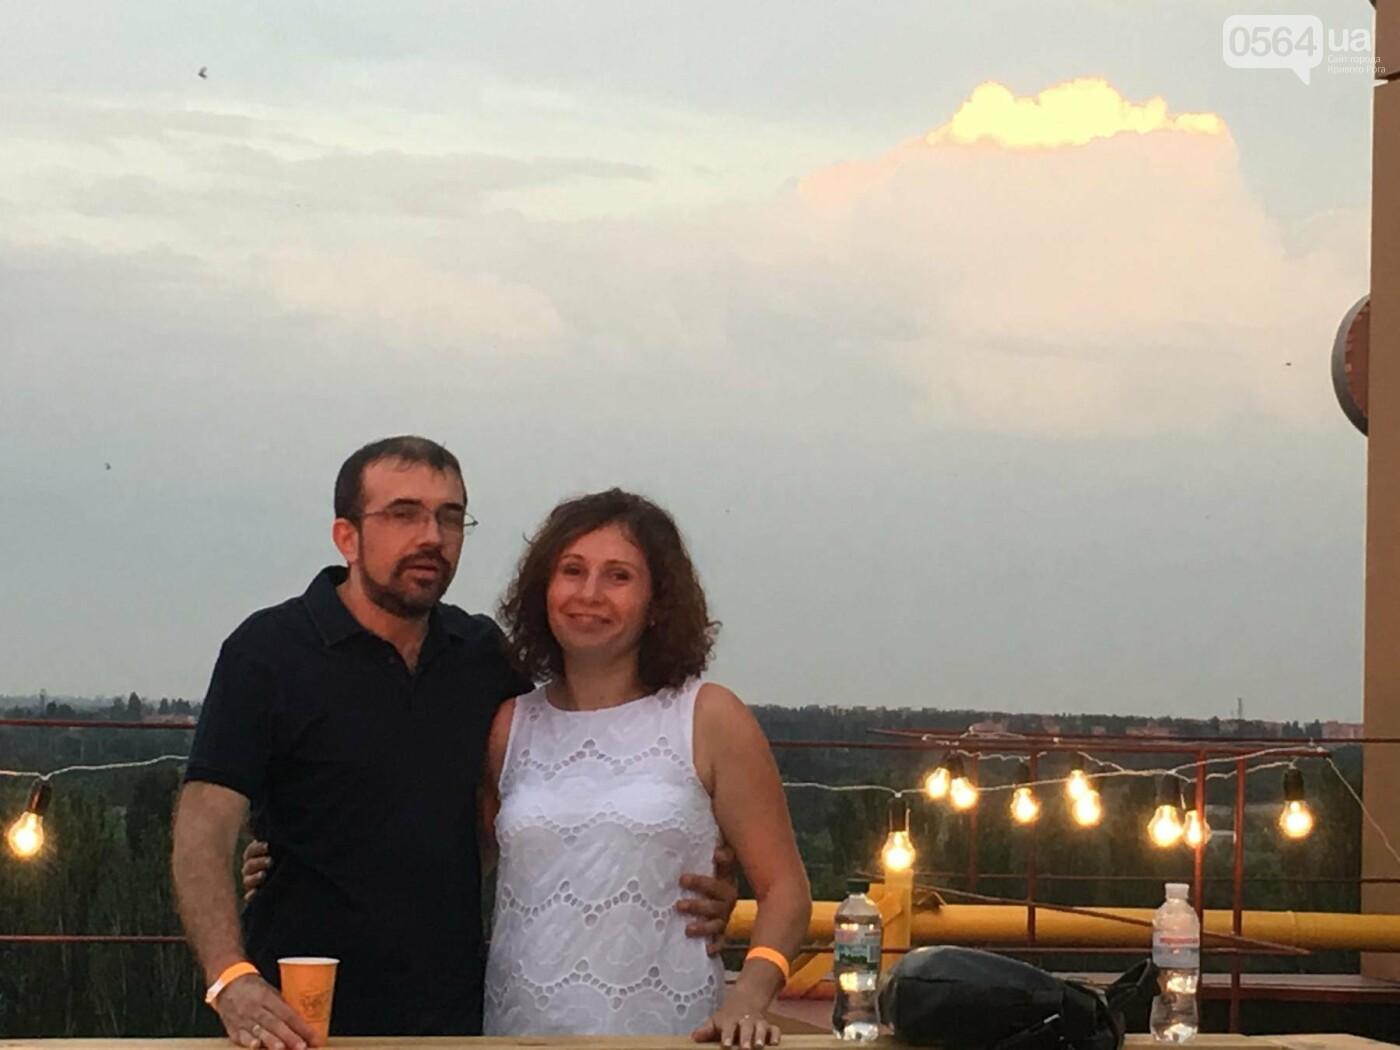 Сотни криворожан встречали закат на крыше отеля под мелодии джаза, - ФОТО, ВИДЕО, фото-3